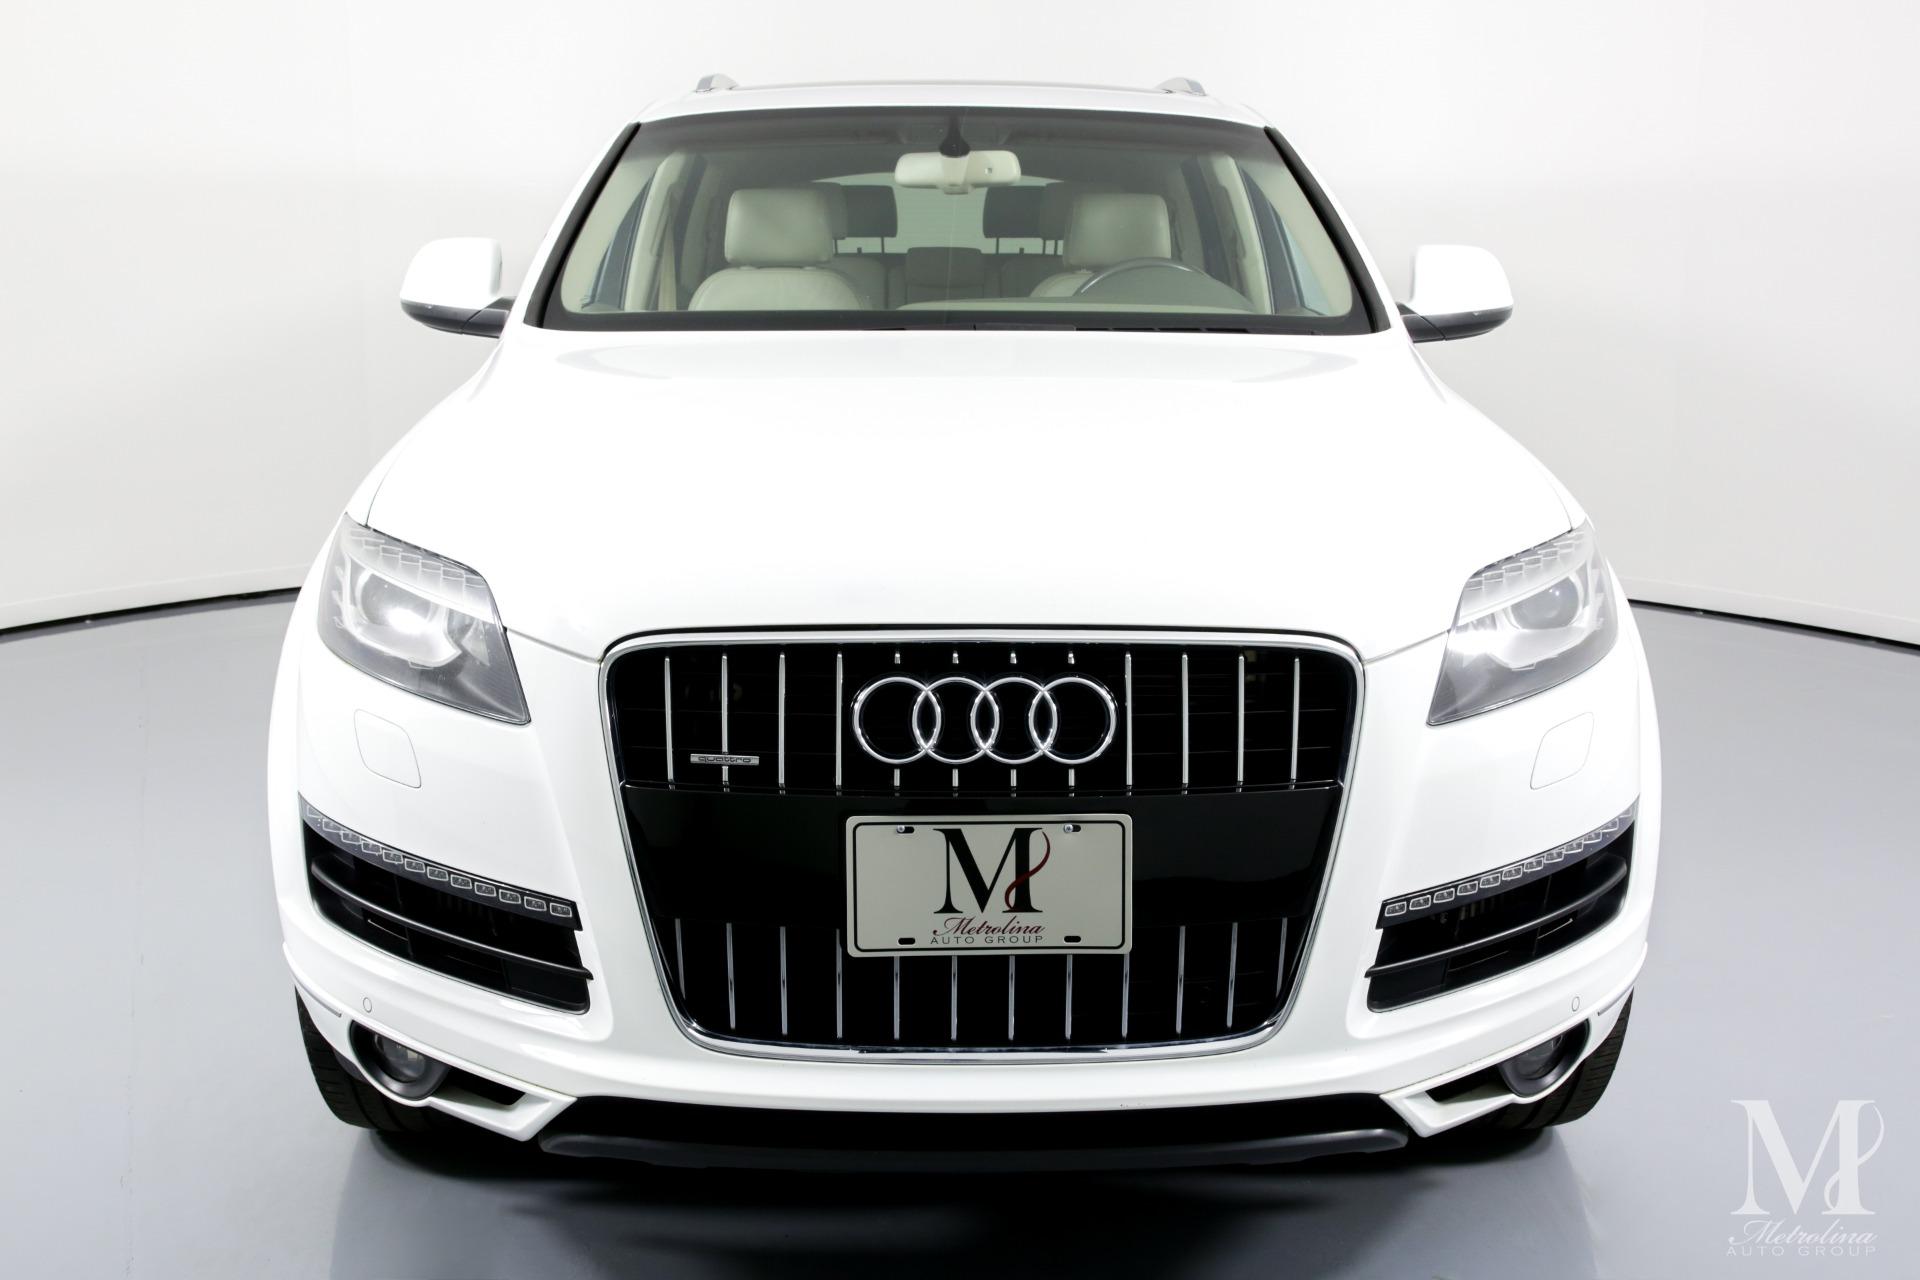 Used 2011 Audi Q7 3.0 quattro TDI Premium Plus AWD 4dr SUV for sale $16,456 at Metrolina Auto Group in Charlotte NC 28217 - 3